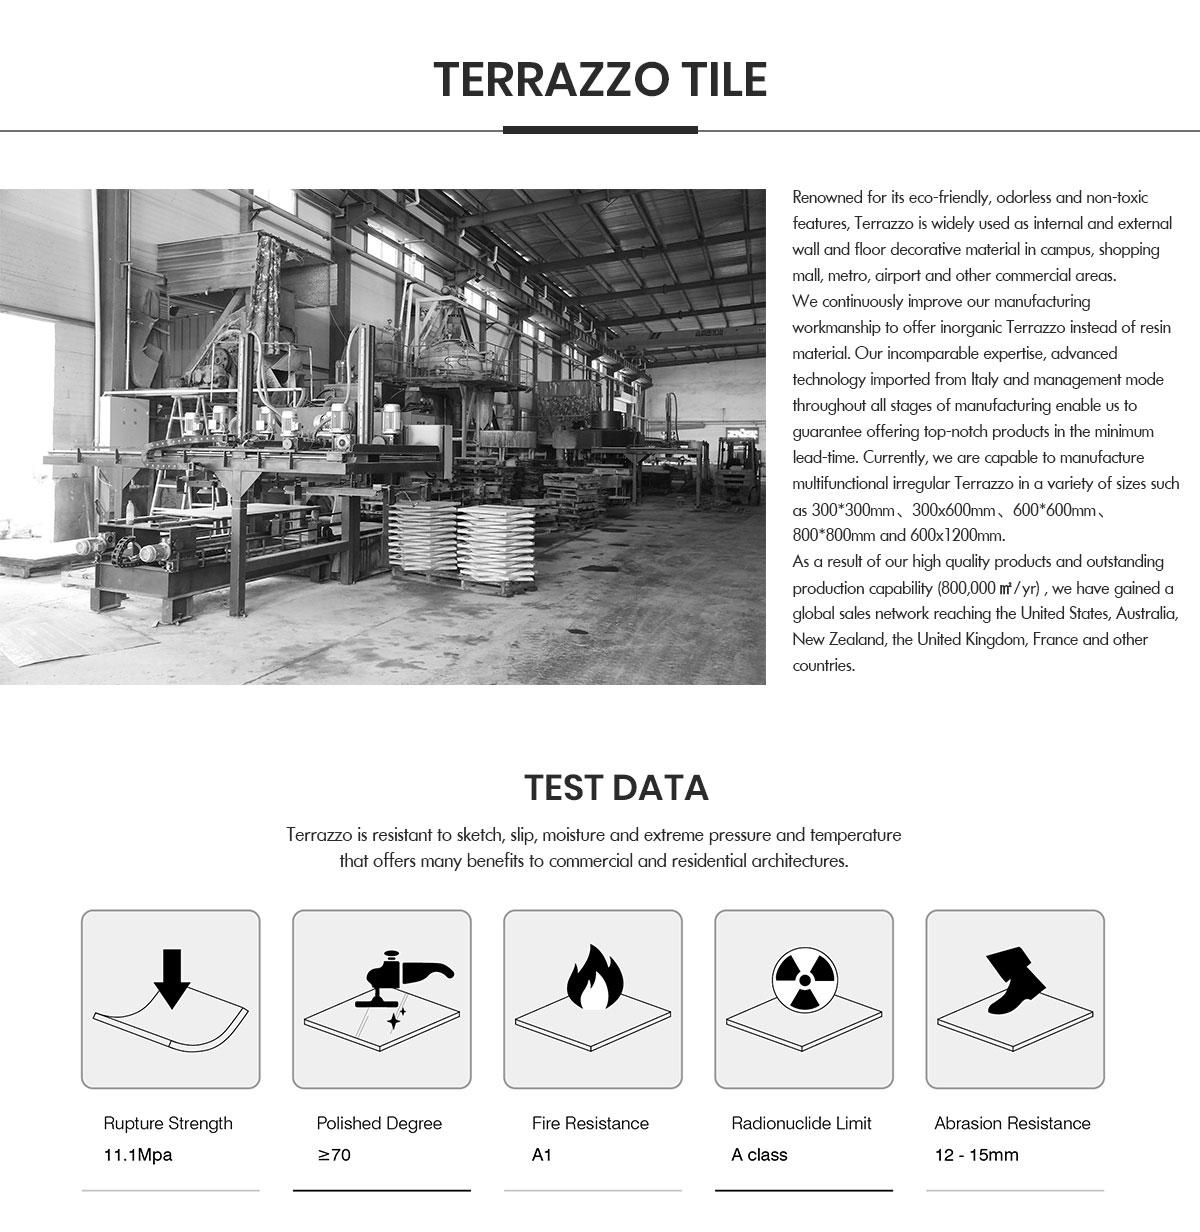 centurymosaic Terrazzo tile